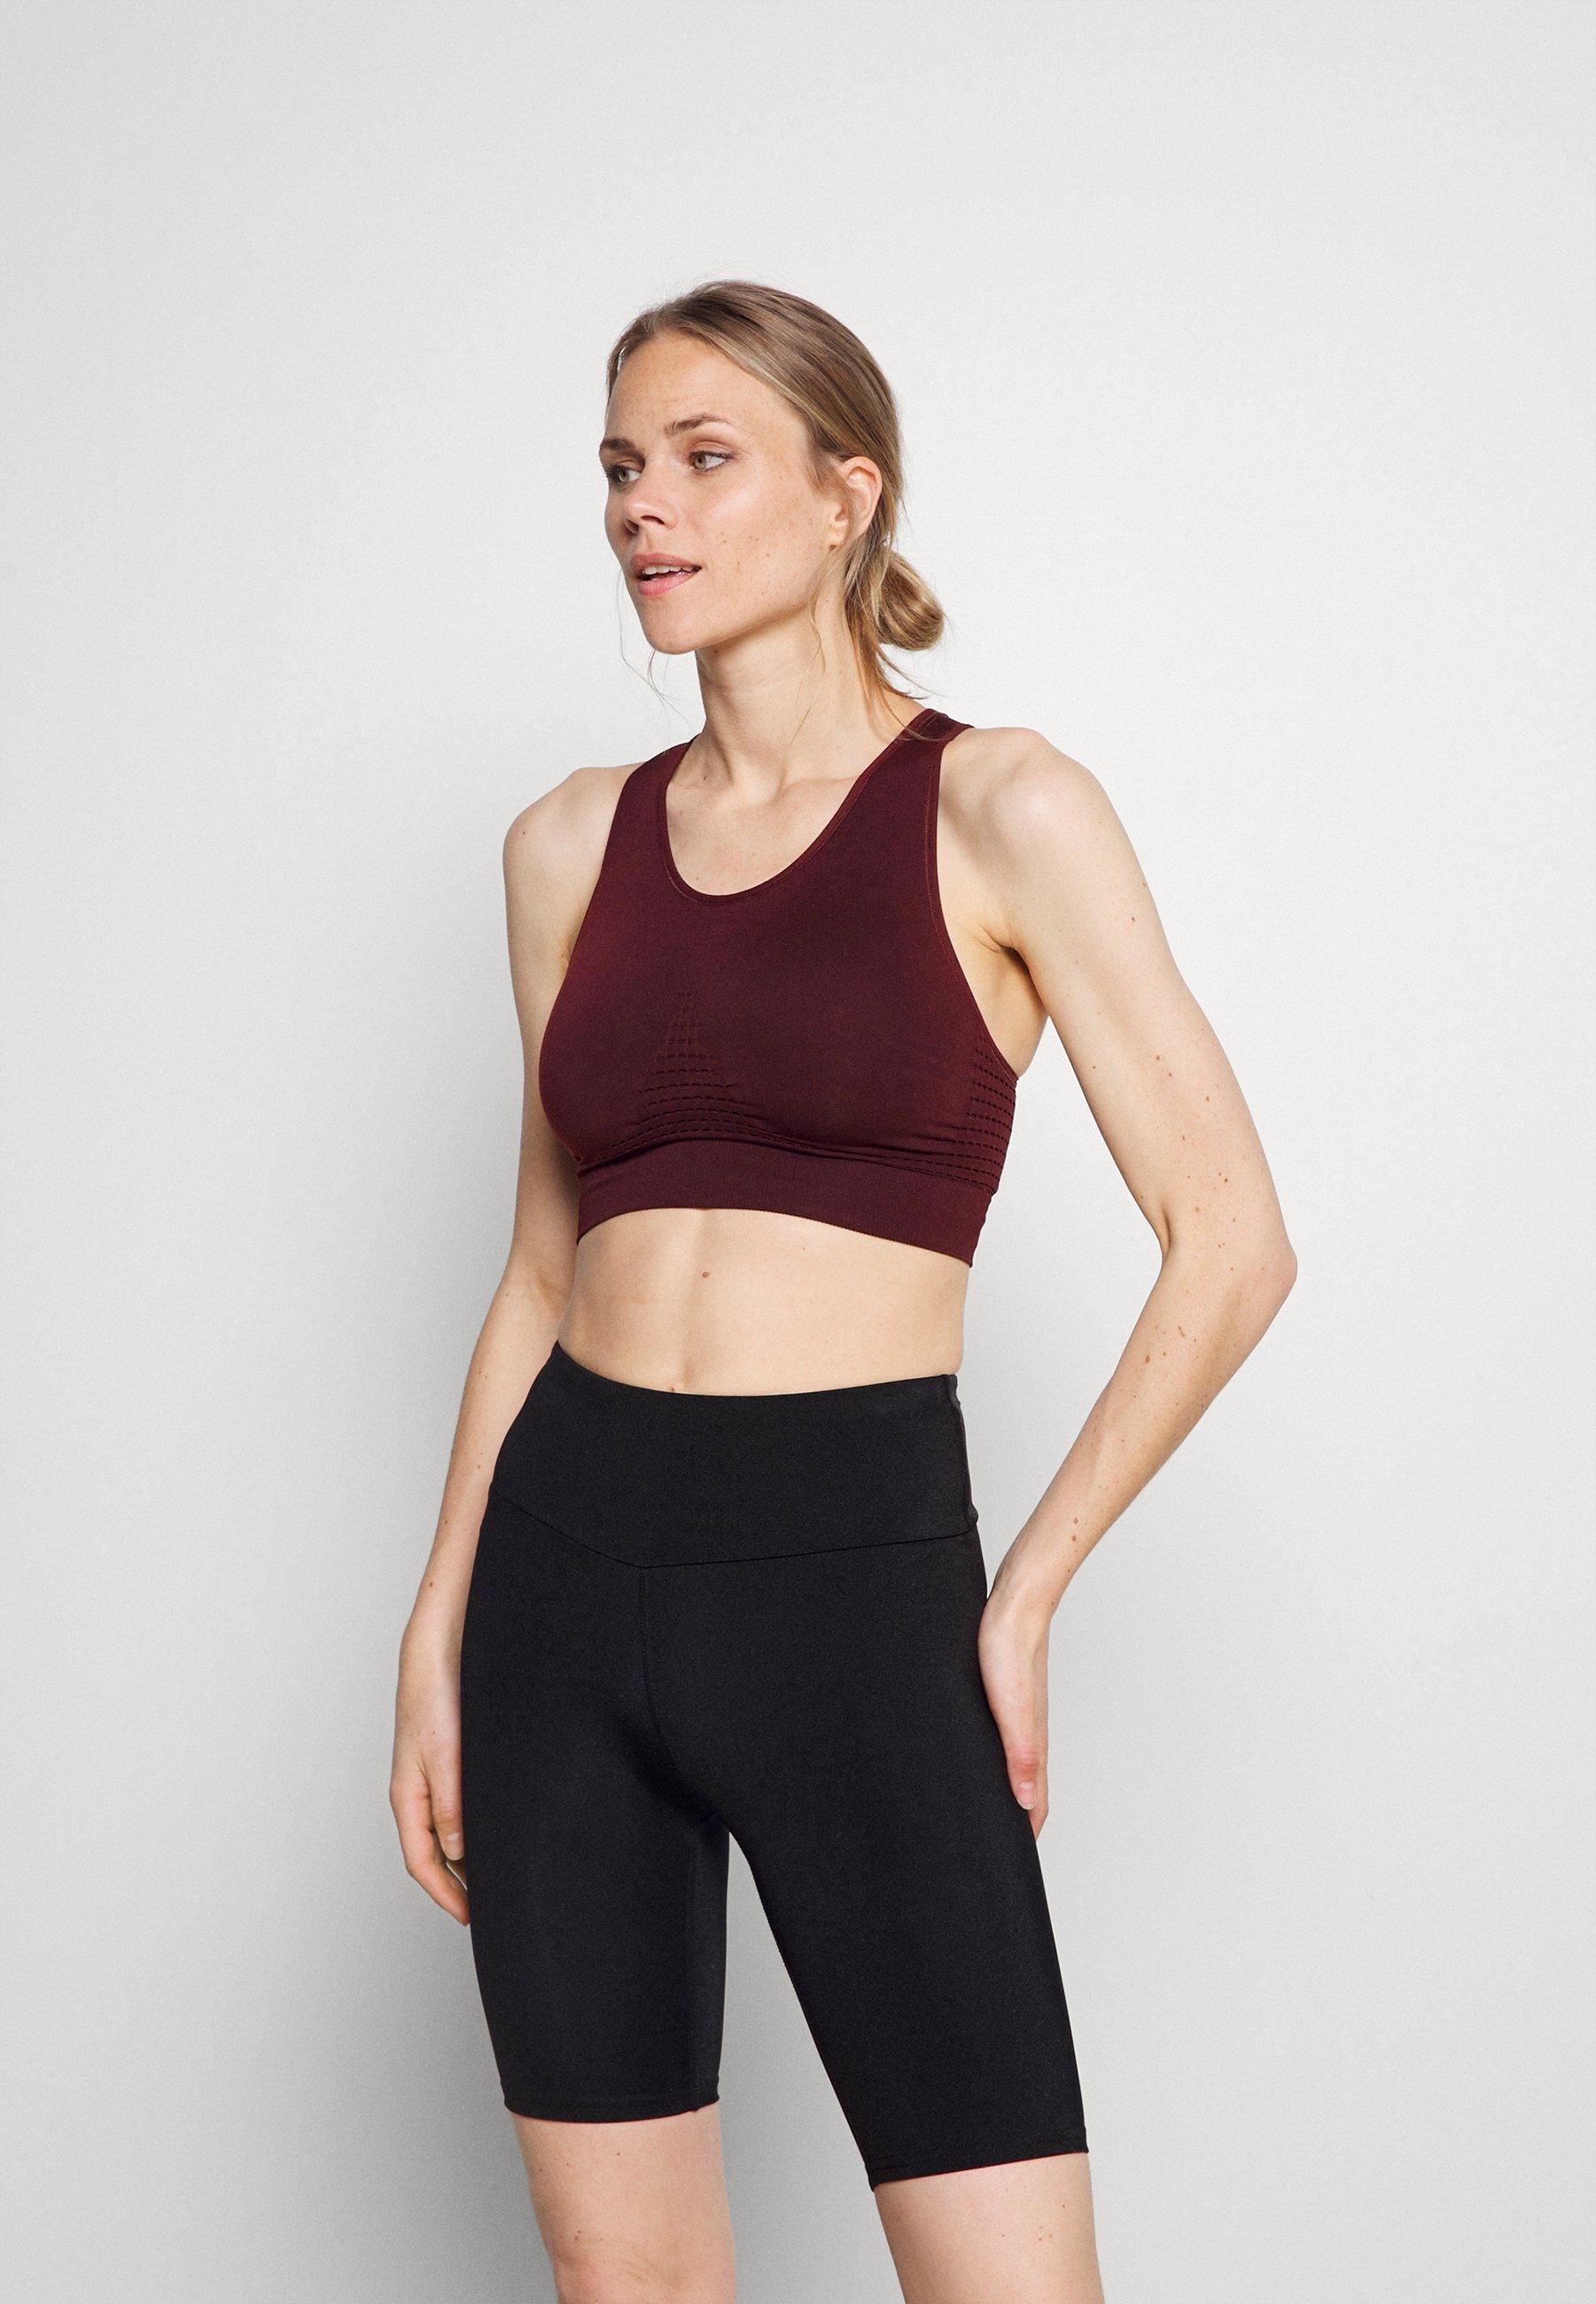 Women STAMINA WORKOUT BRA - Light support sports bra - black cherry purple